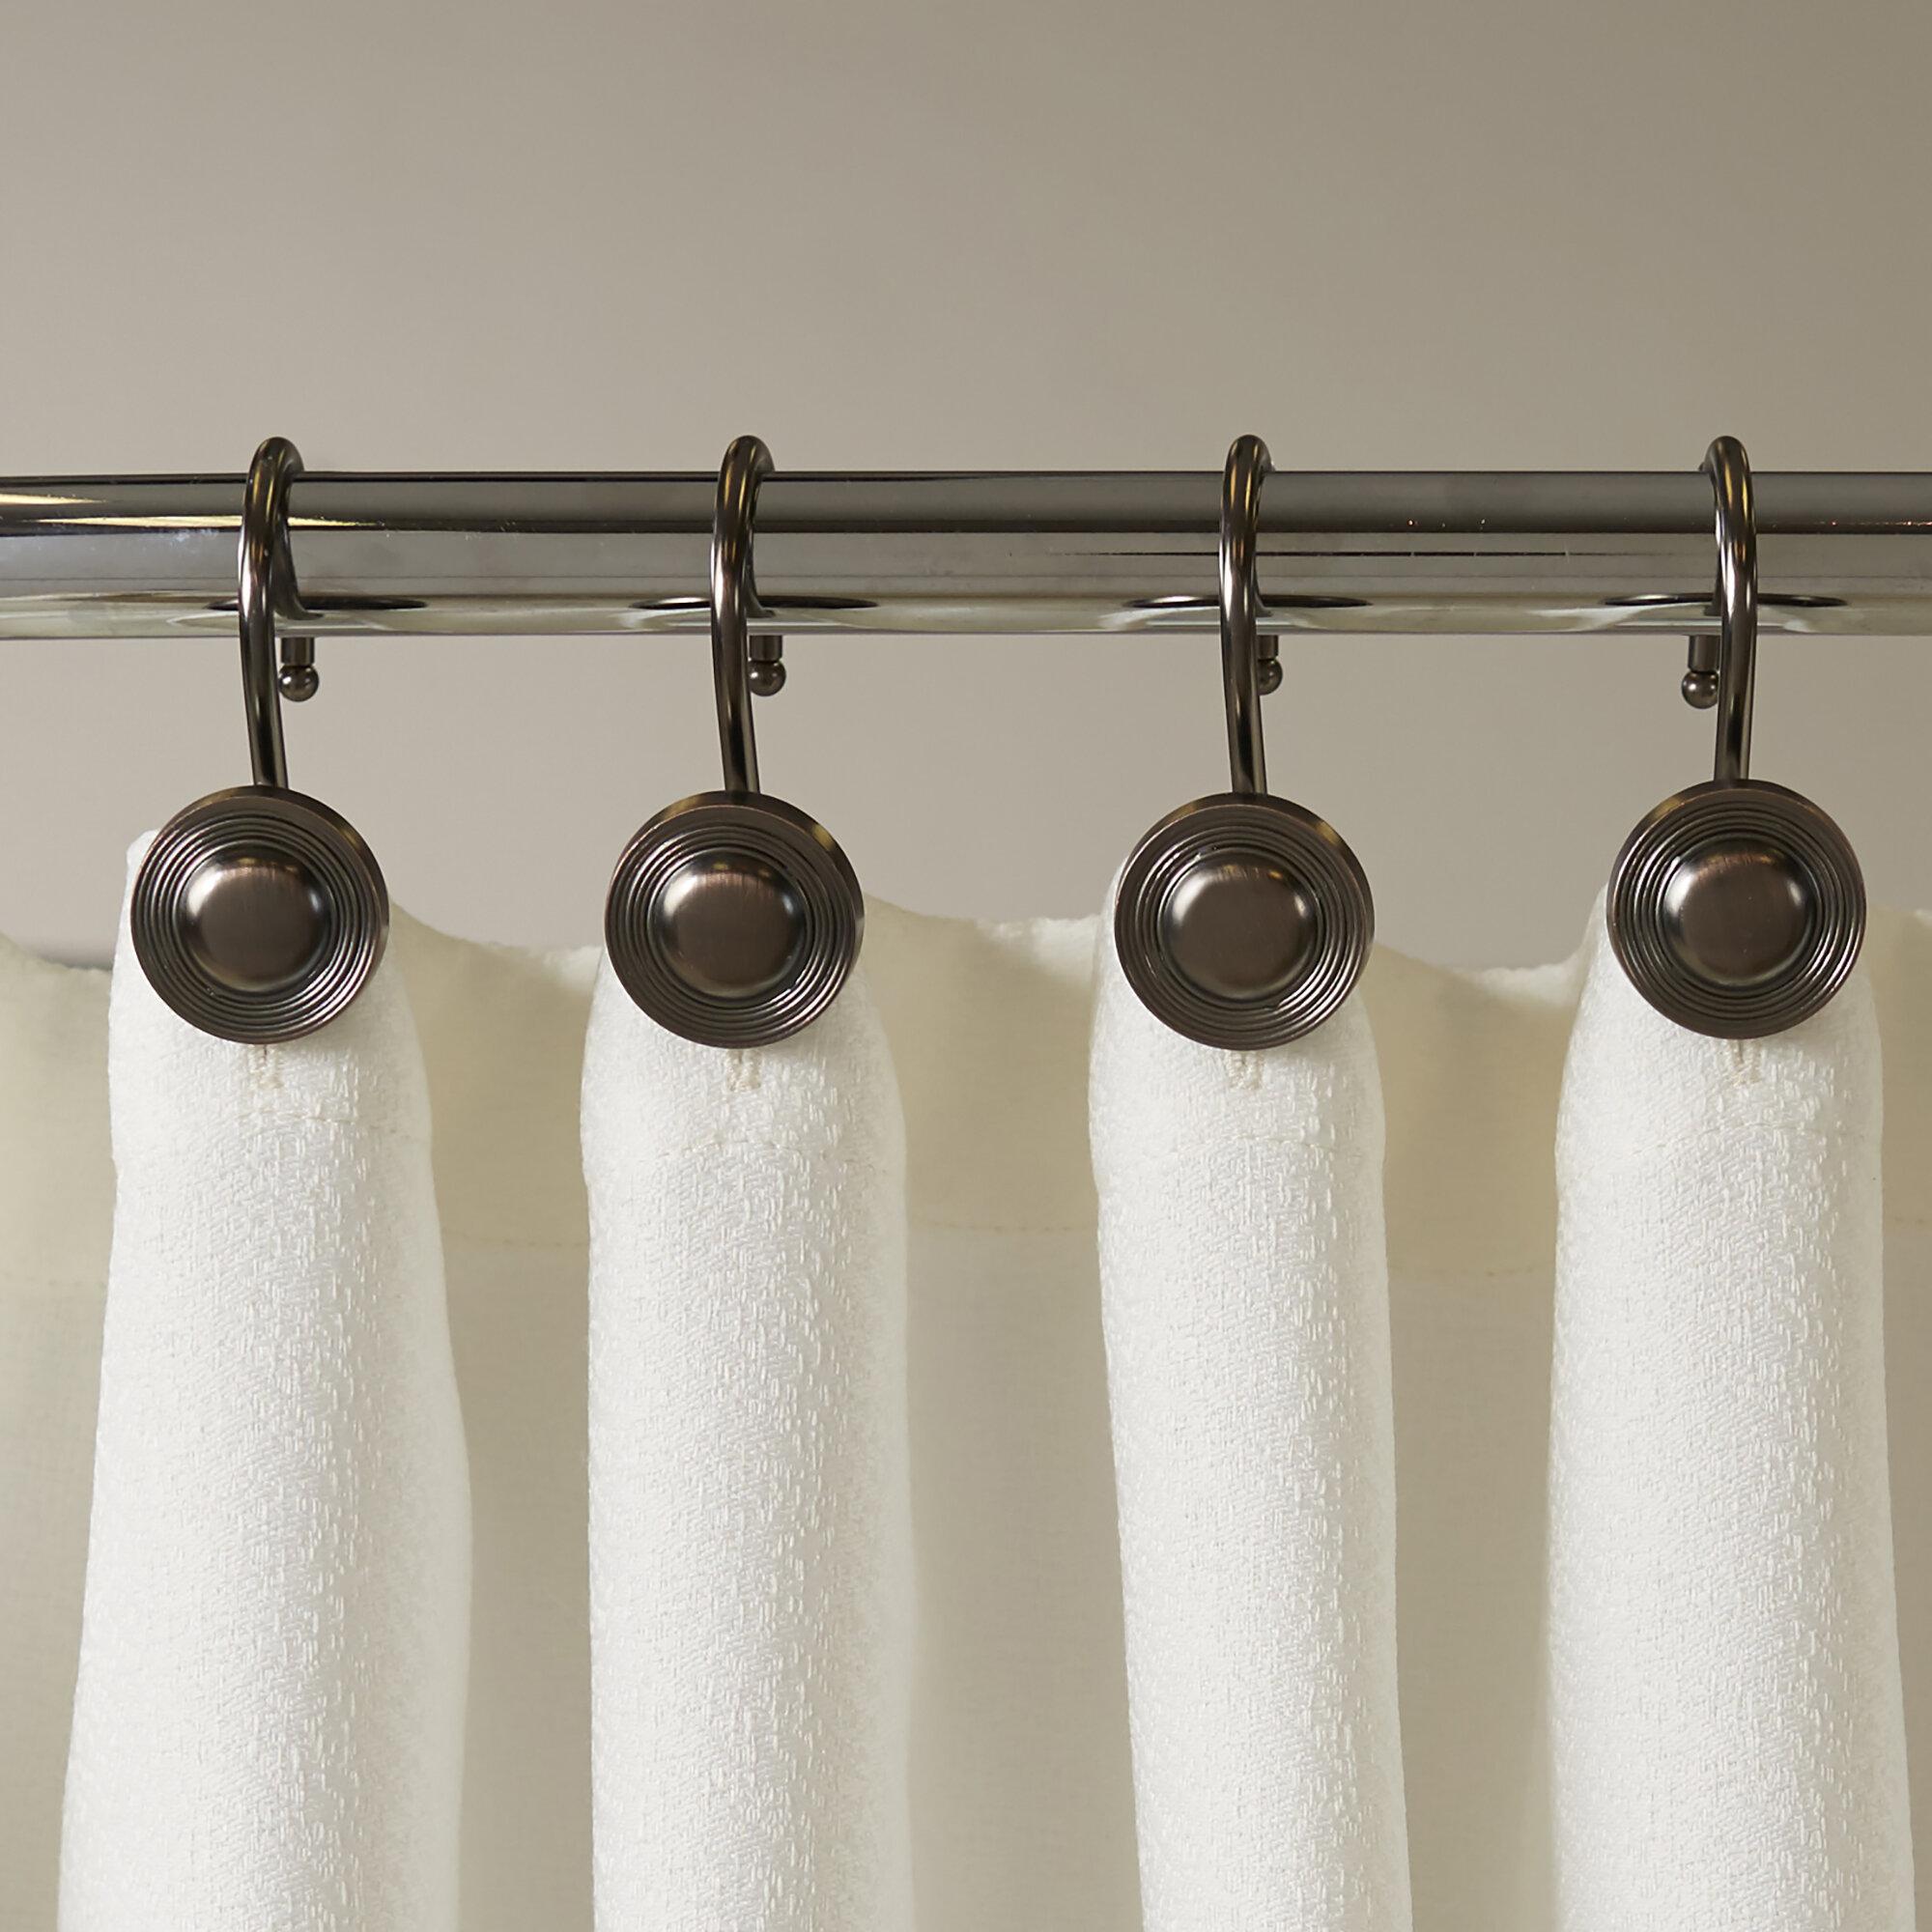 Kiera Grace Button Design Shower Curtain Hooks Shower